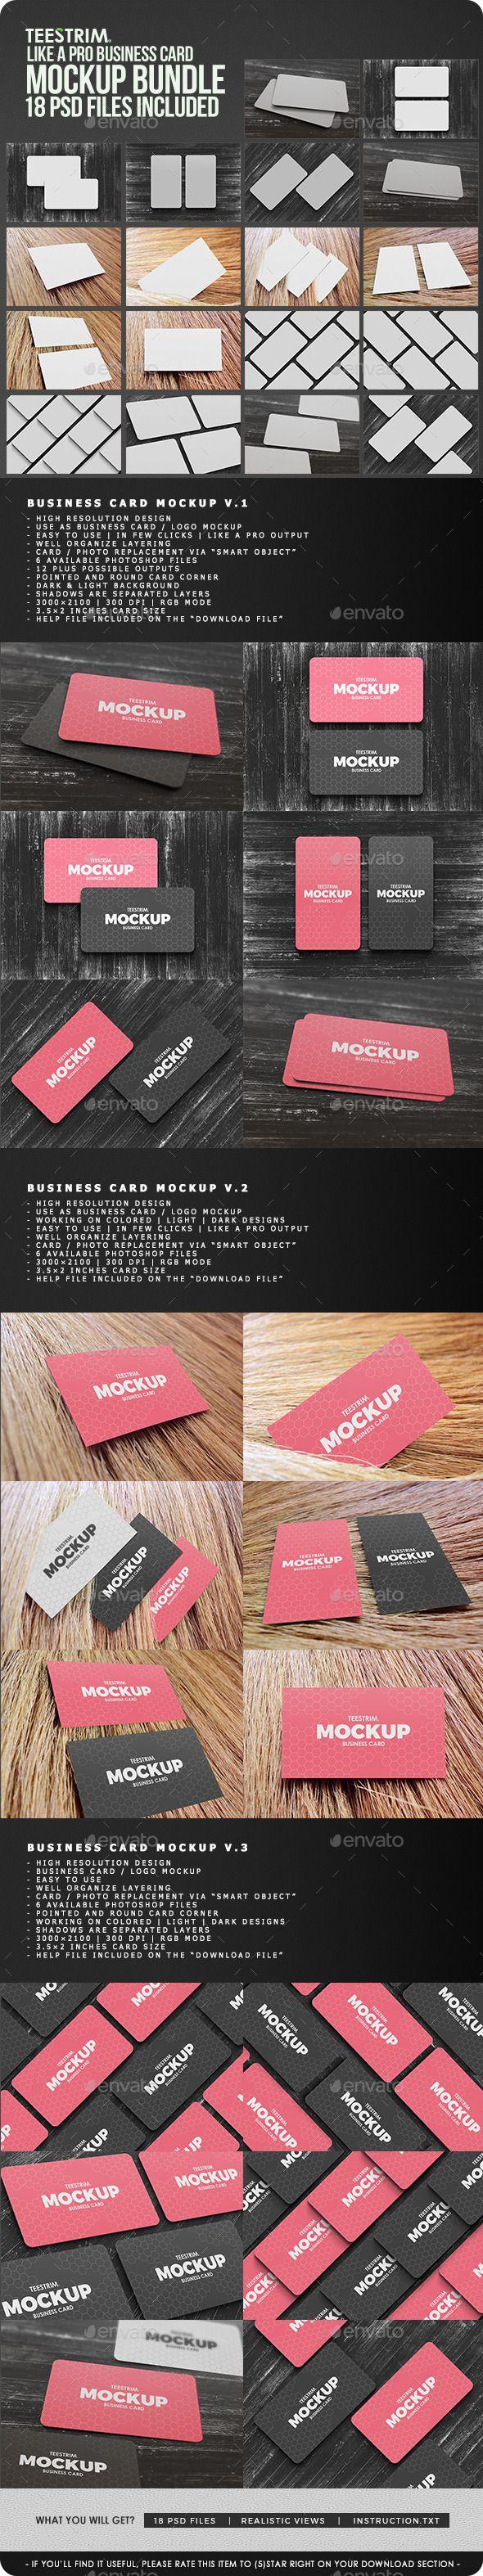 136 best mock up images on pinterest miniatures mockup and model 18 in 1 business card mock up bundle v1 reheart Choice Image